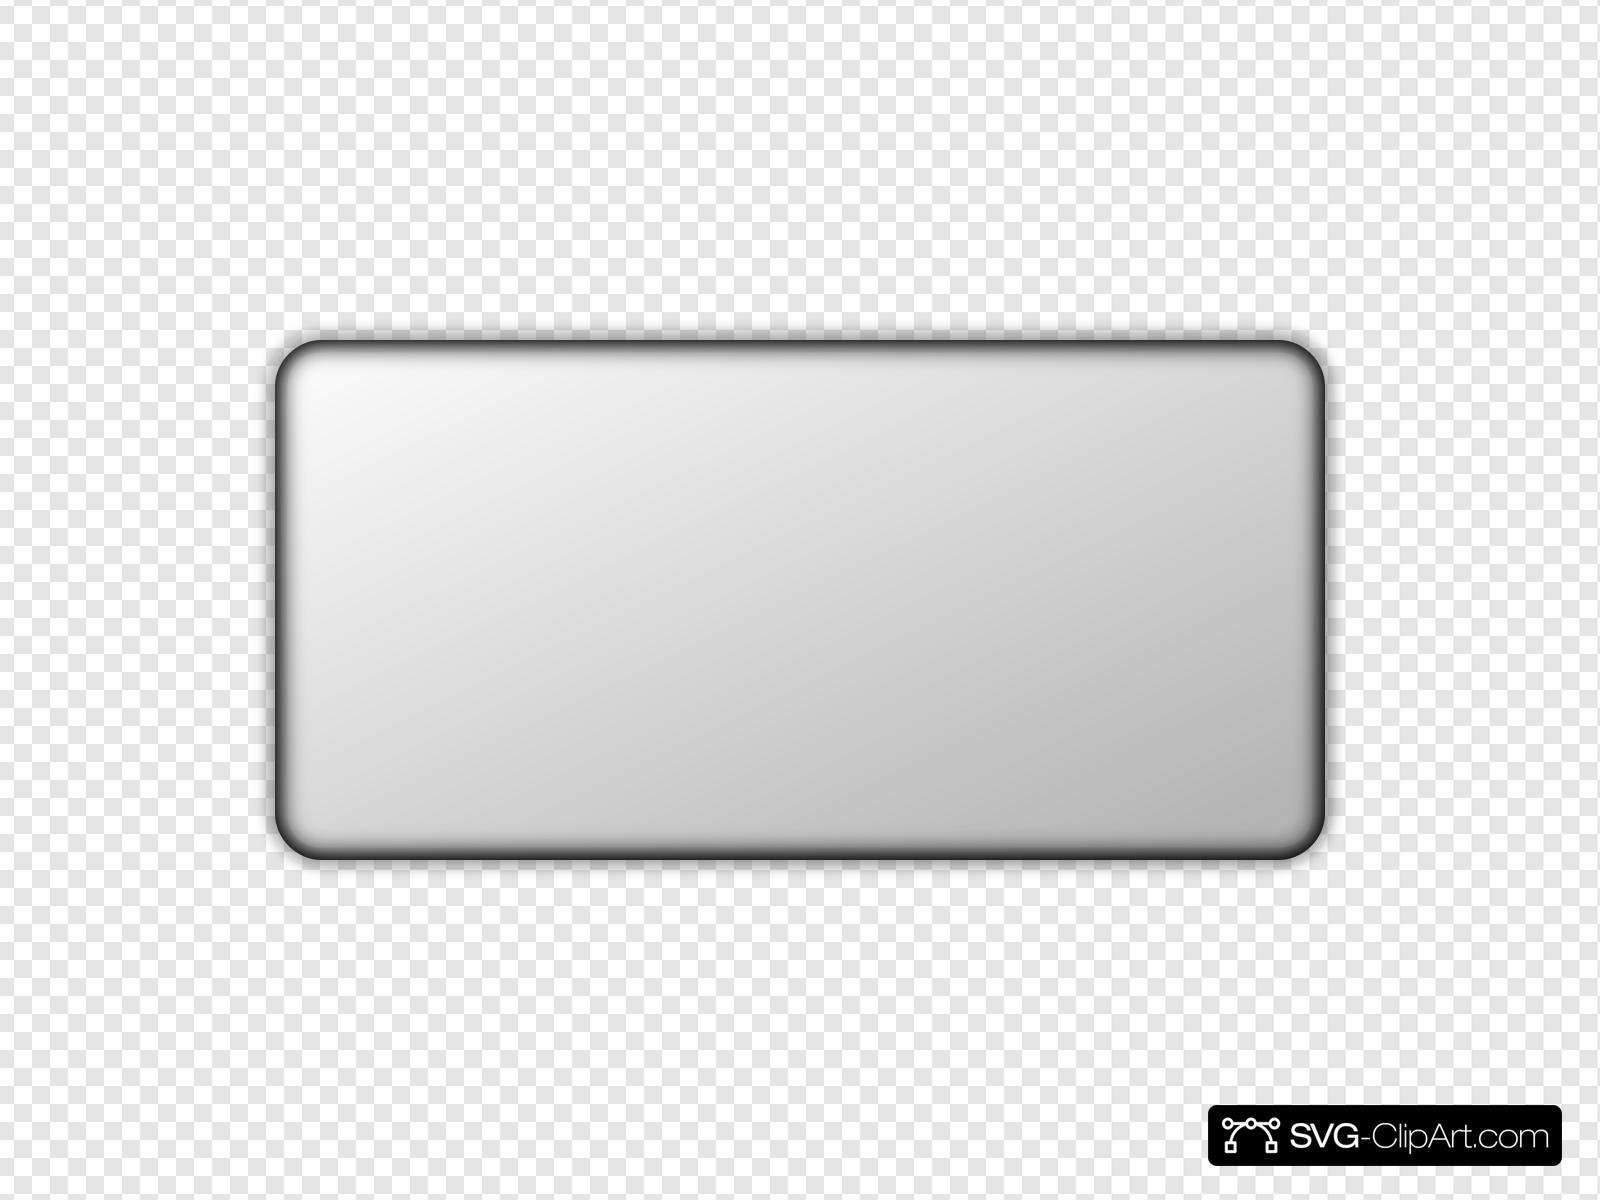 Gray button clipart clip art black and white Light Gray Button Rectangle Clip art, Icon and SVG - SVG Clipart clip art black and white